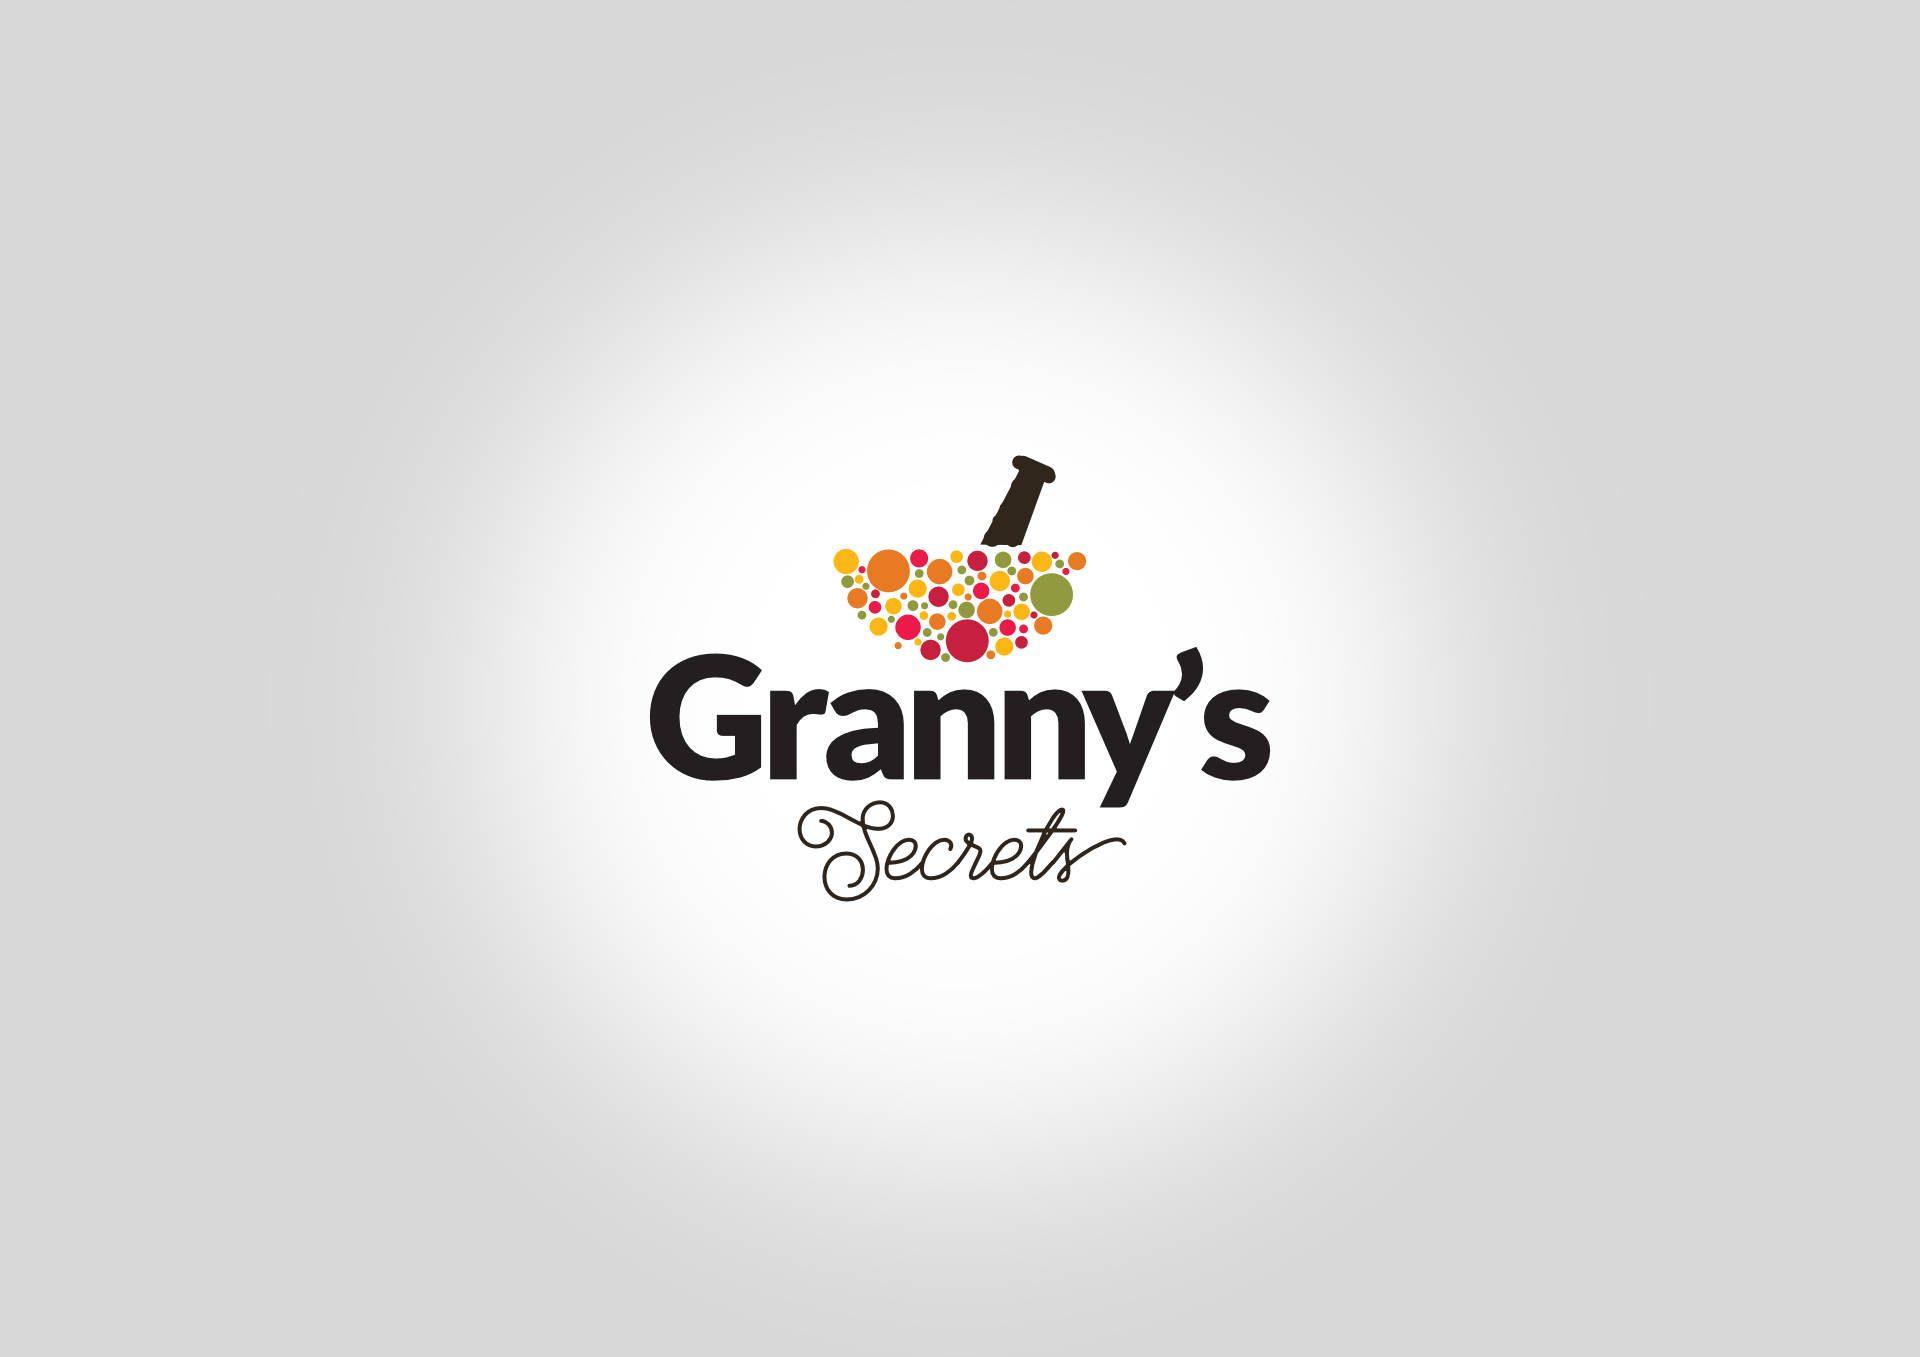 Granny's Secrets